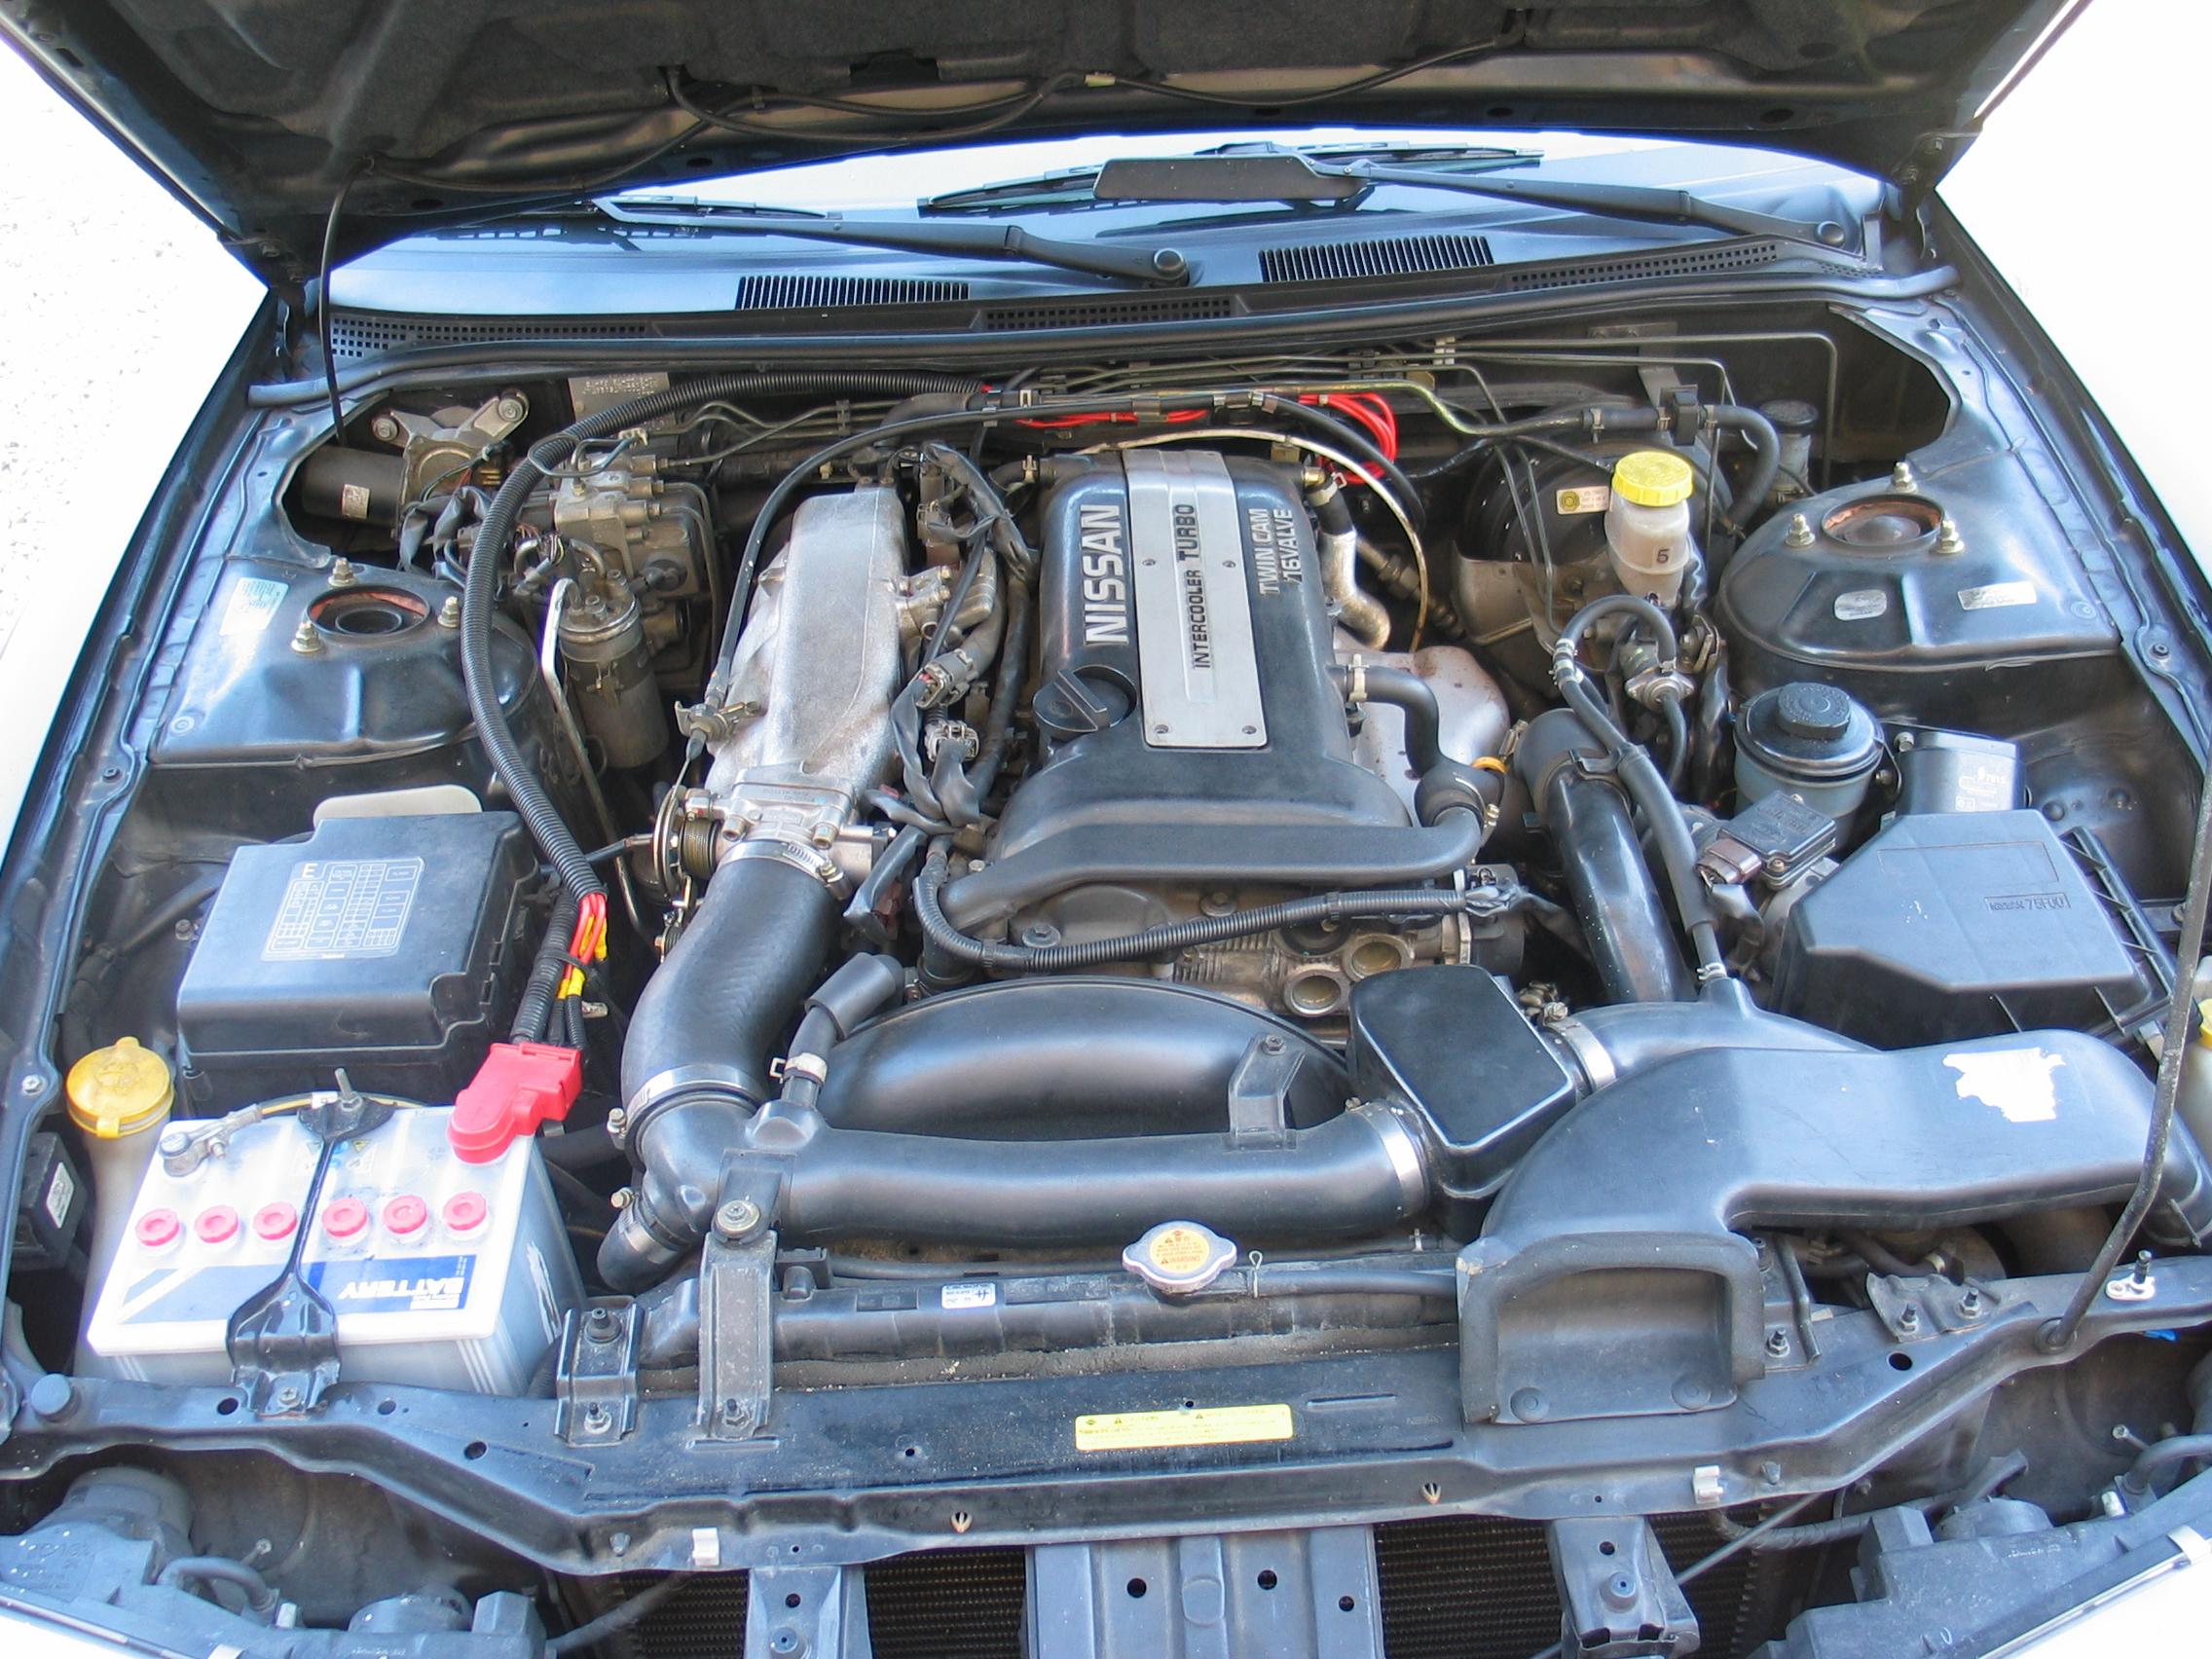 NISSAN MARCH engine